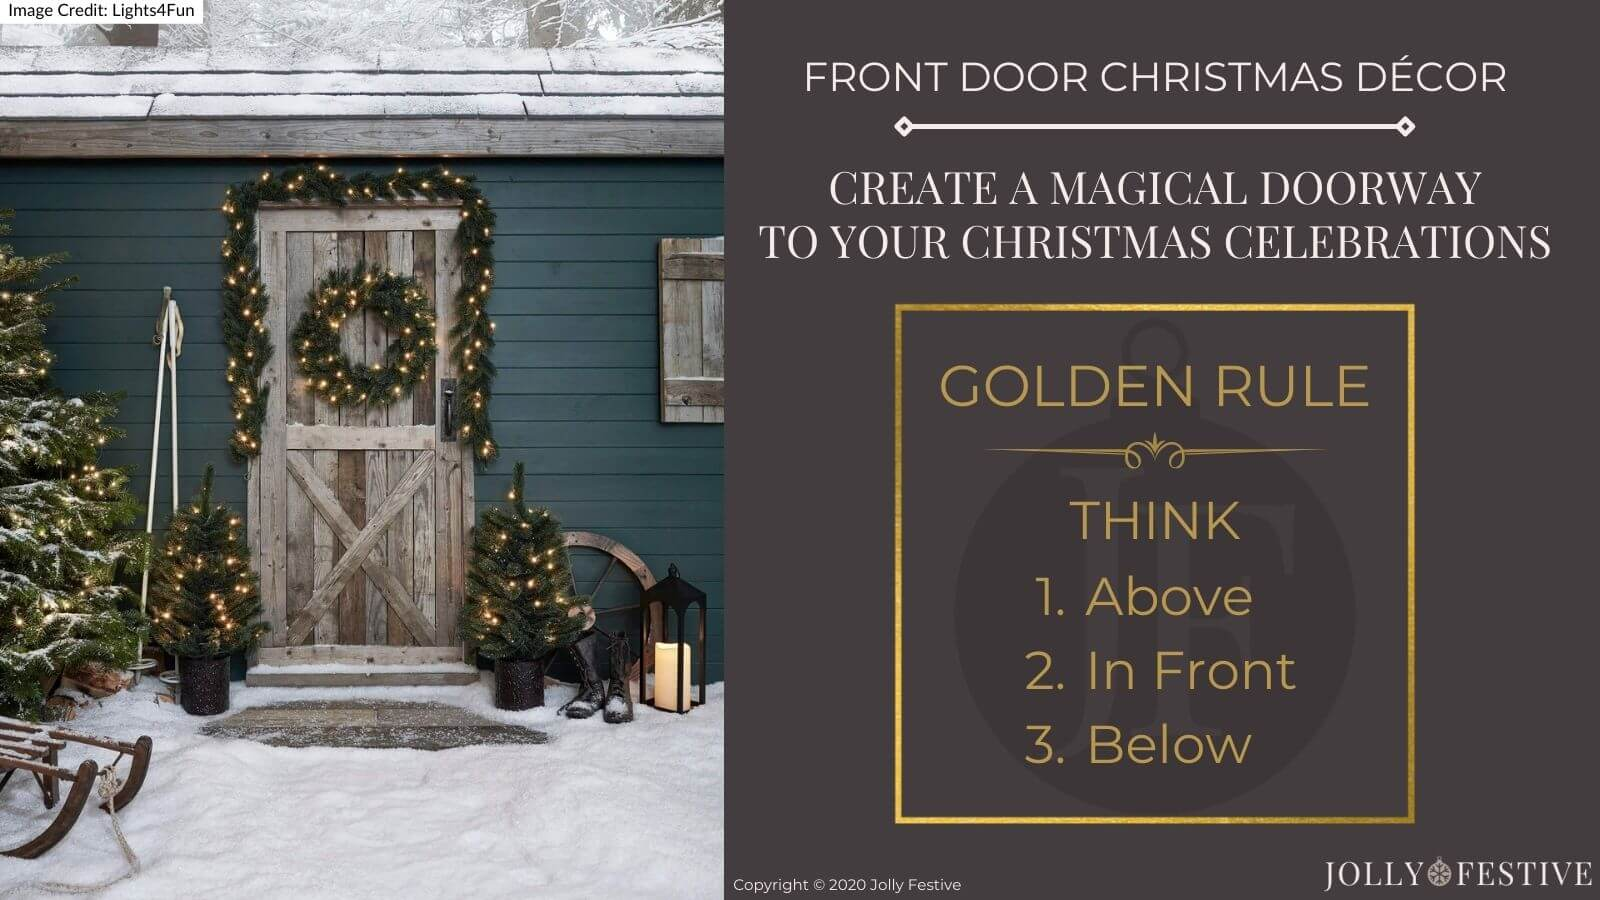 Front Door Christmas Décor Golden Rule - think above, in front and below